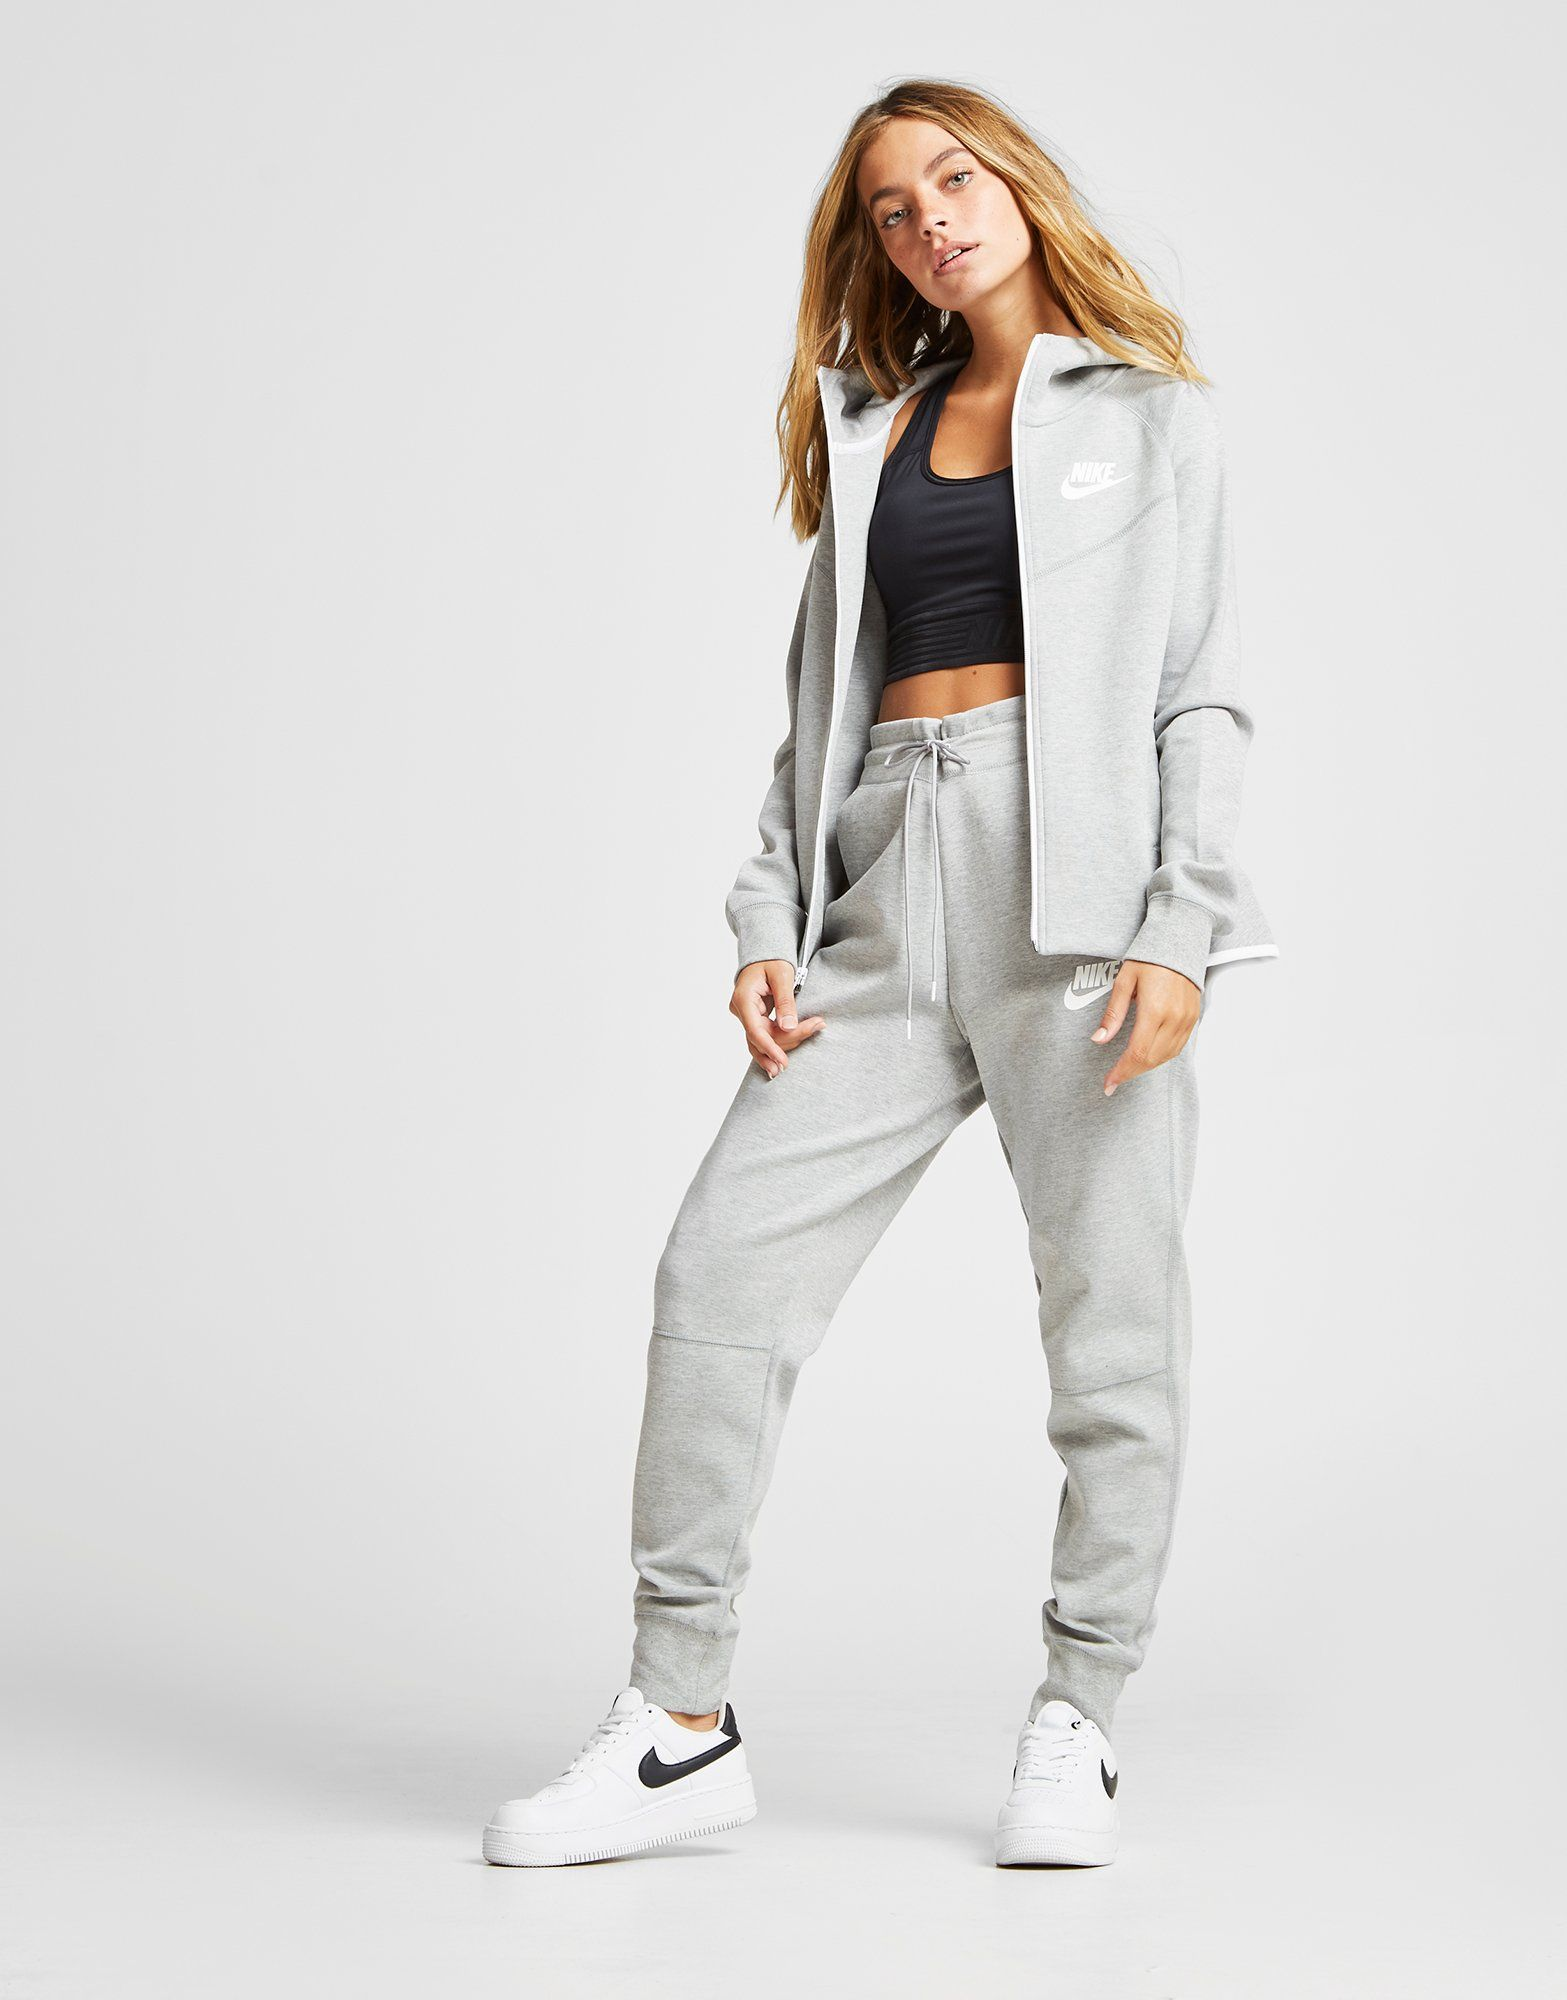 Nike Tech Fleece Track Pants Shop online for Nike Tech